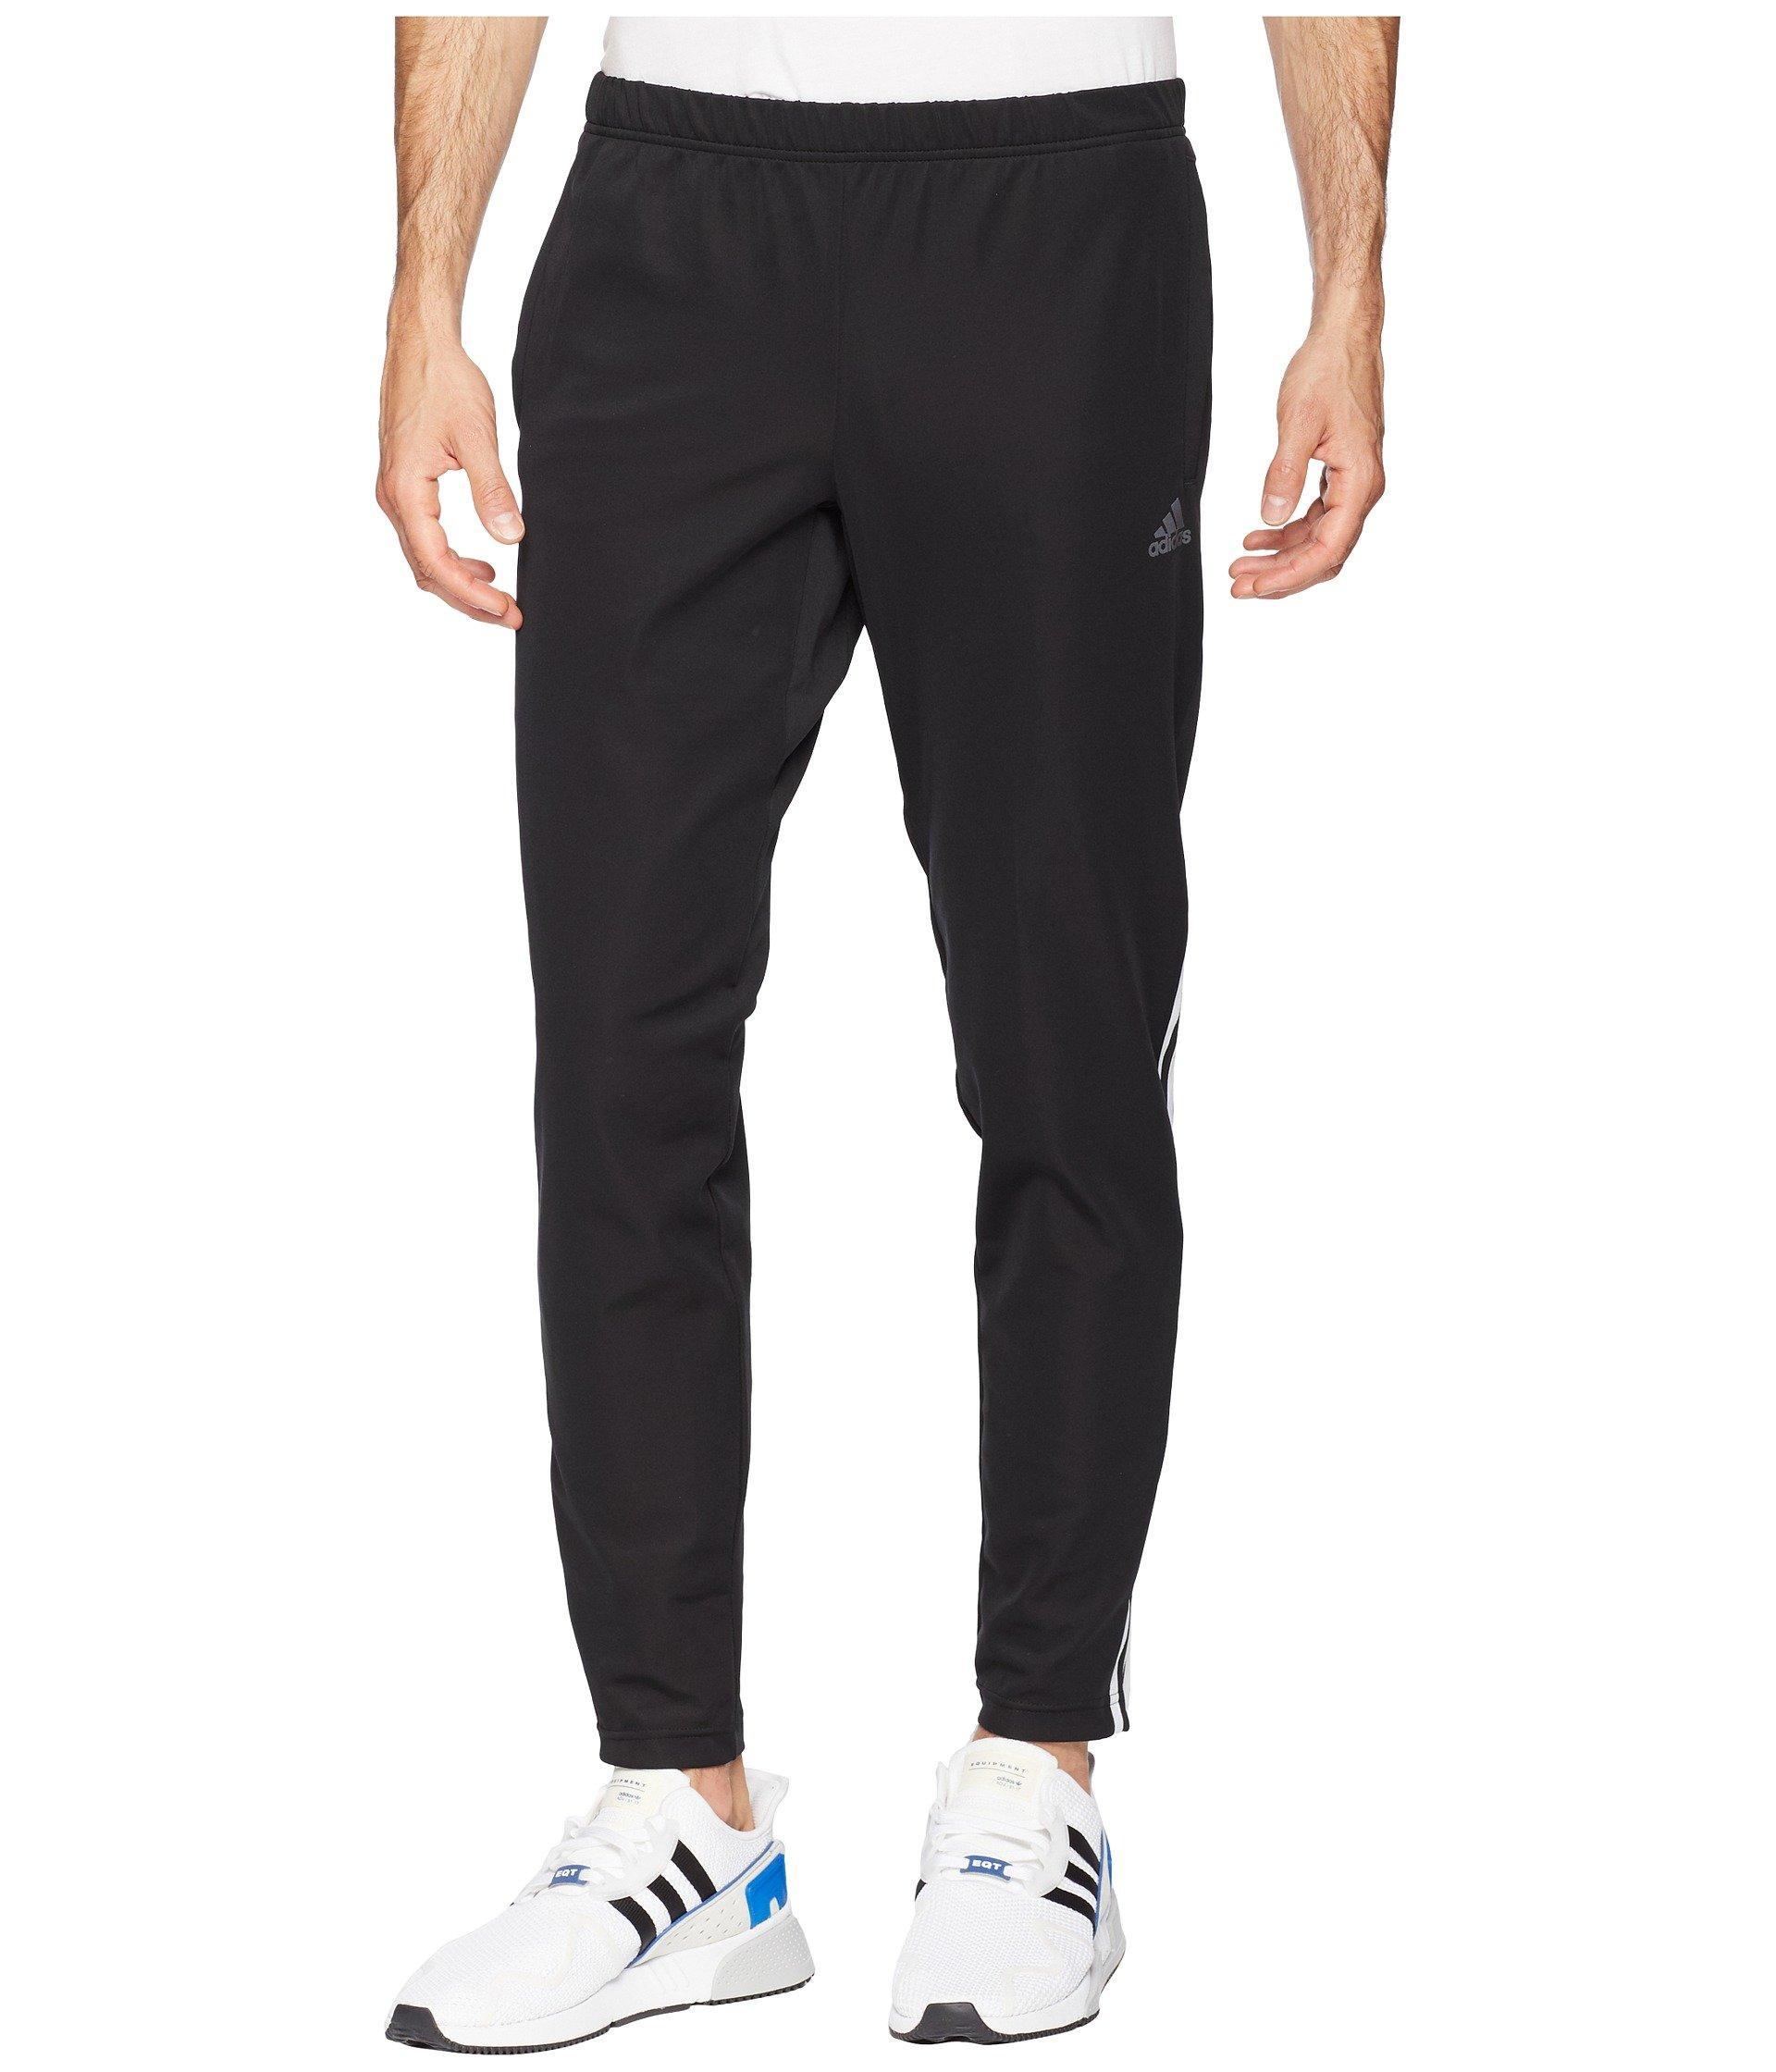 adidas soccer pants cheap, Adidas 3s Performance Ankle Half